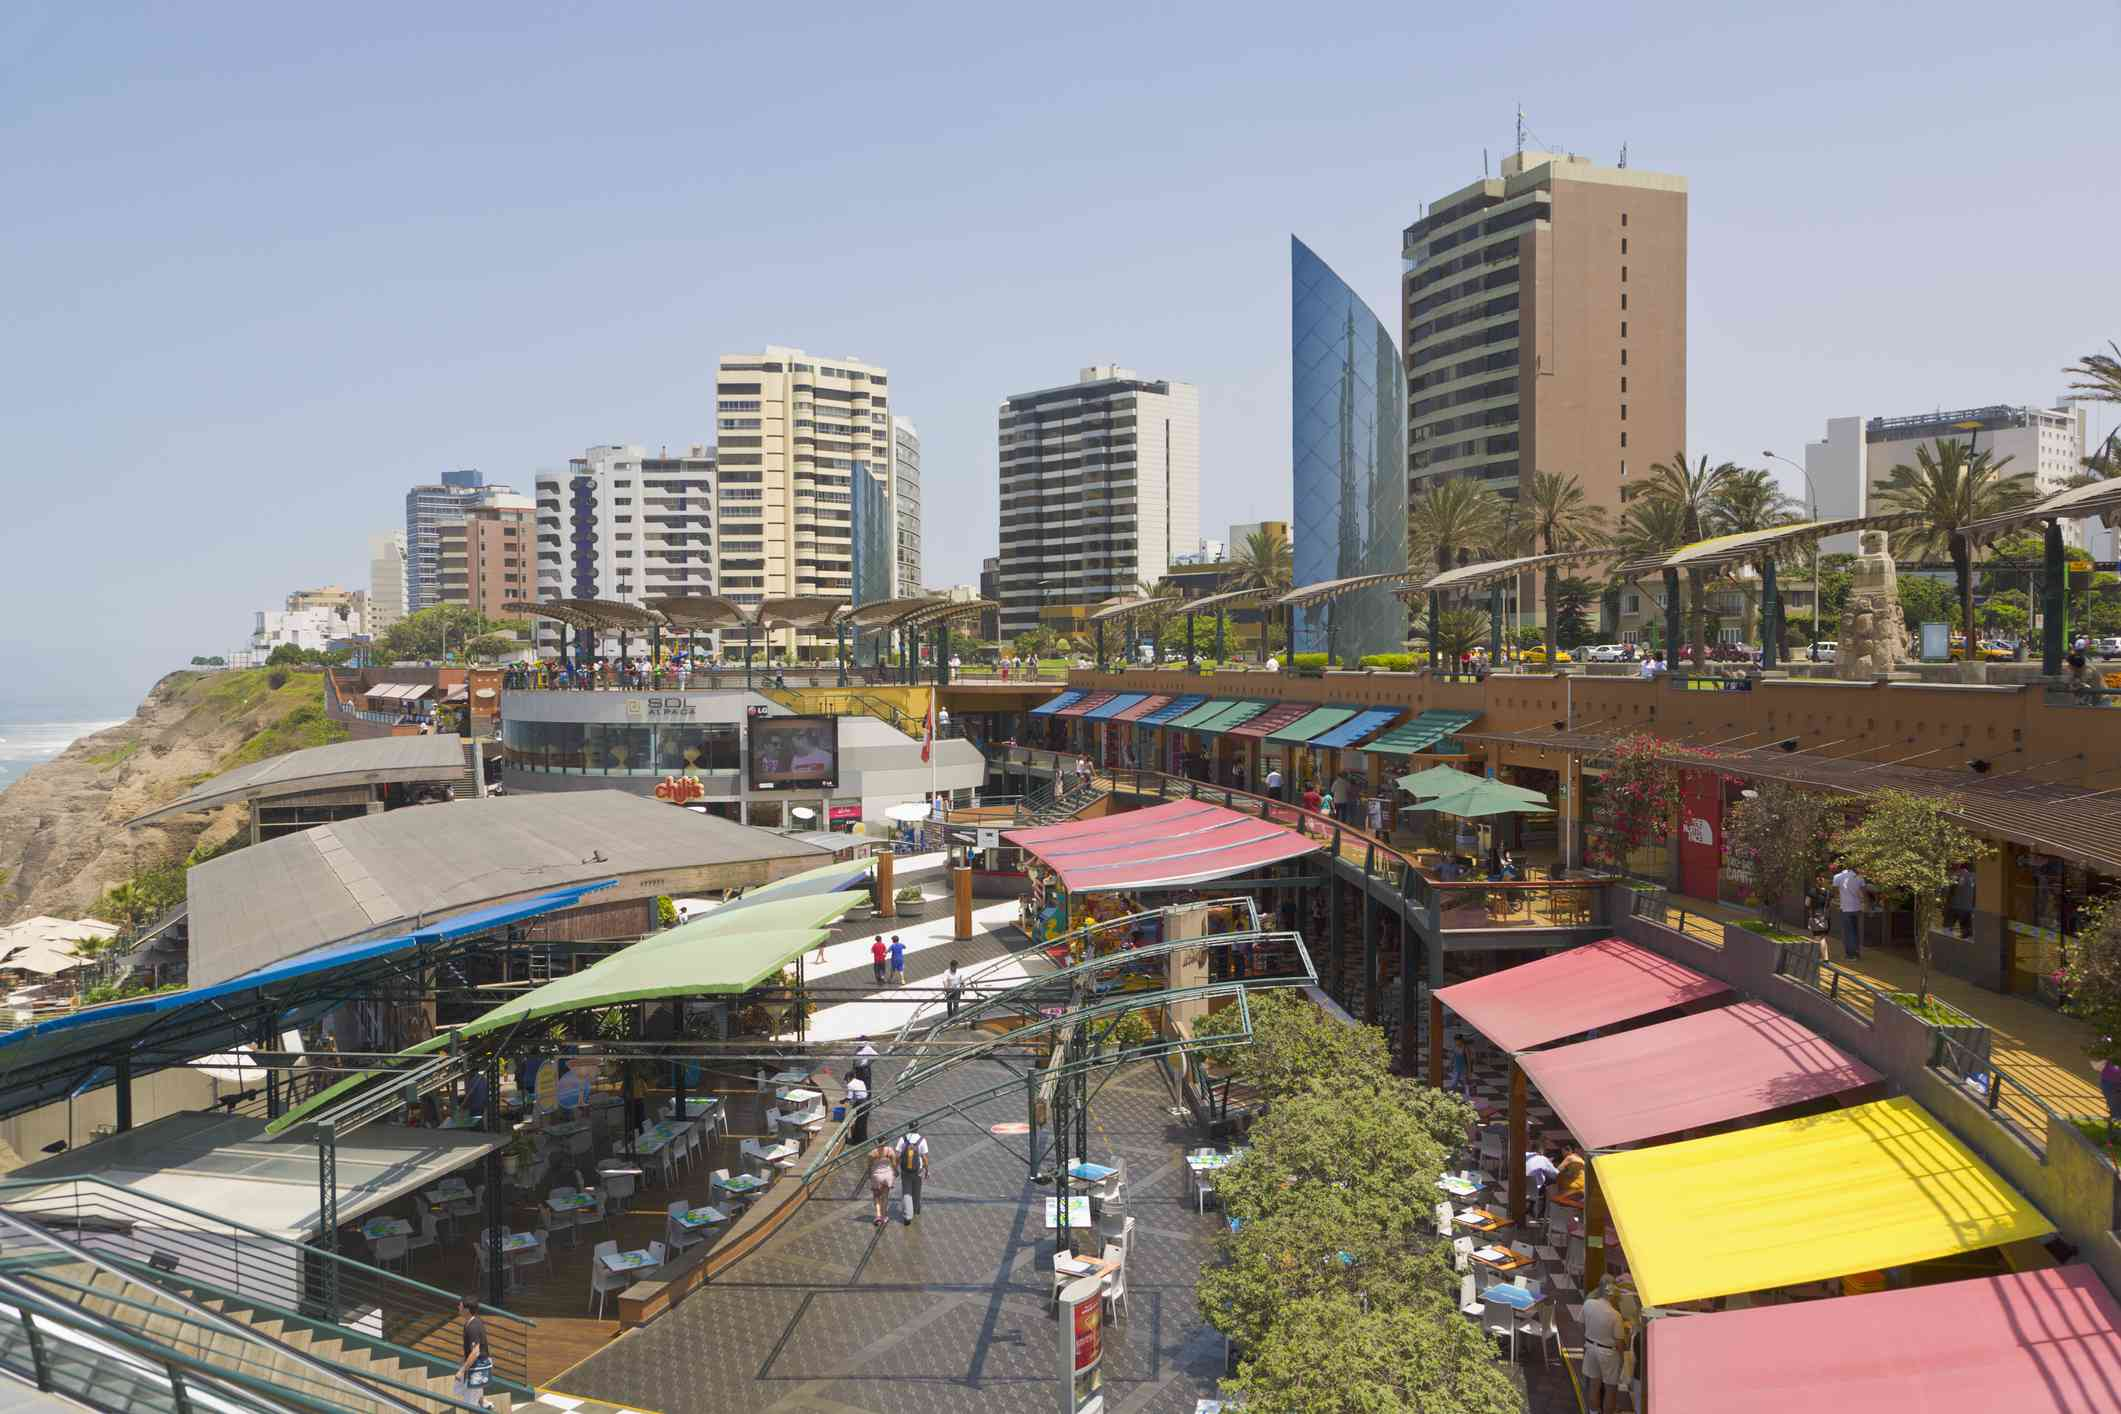 Larcomar Shopping Centre, Miraflores, Lima, Peru